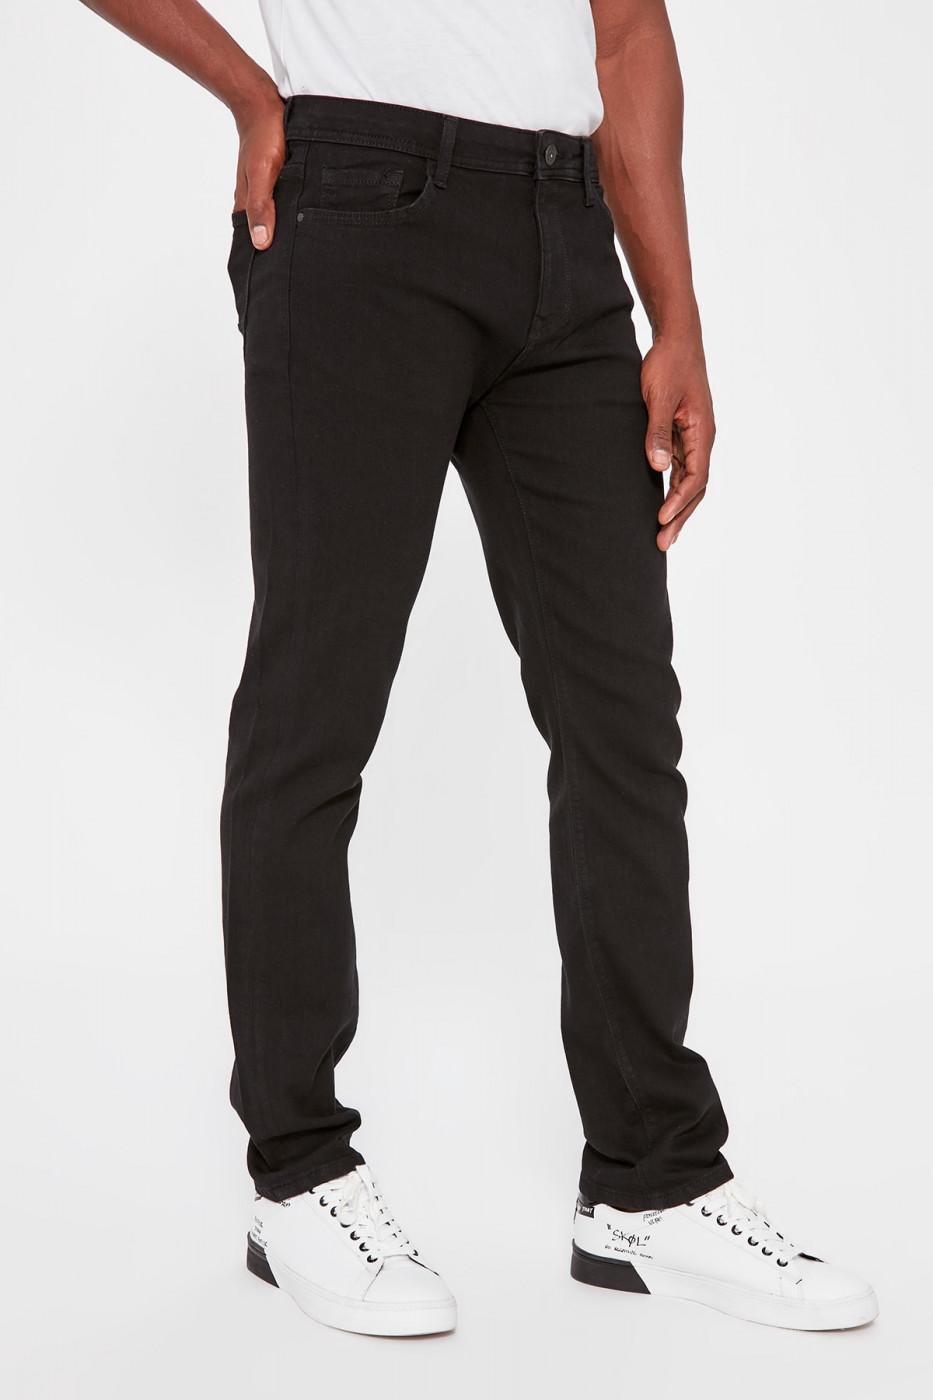 Trendyol Black Male Straight Jeans